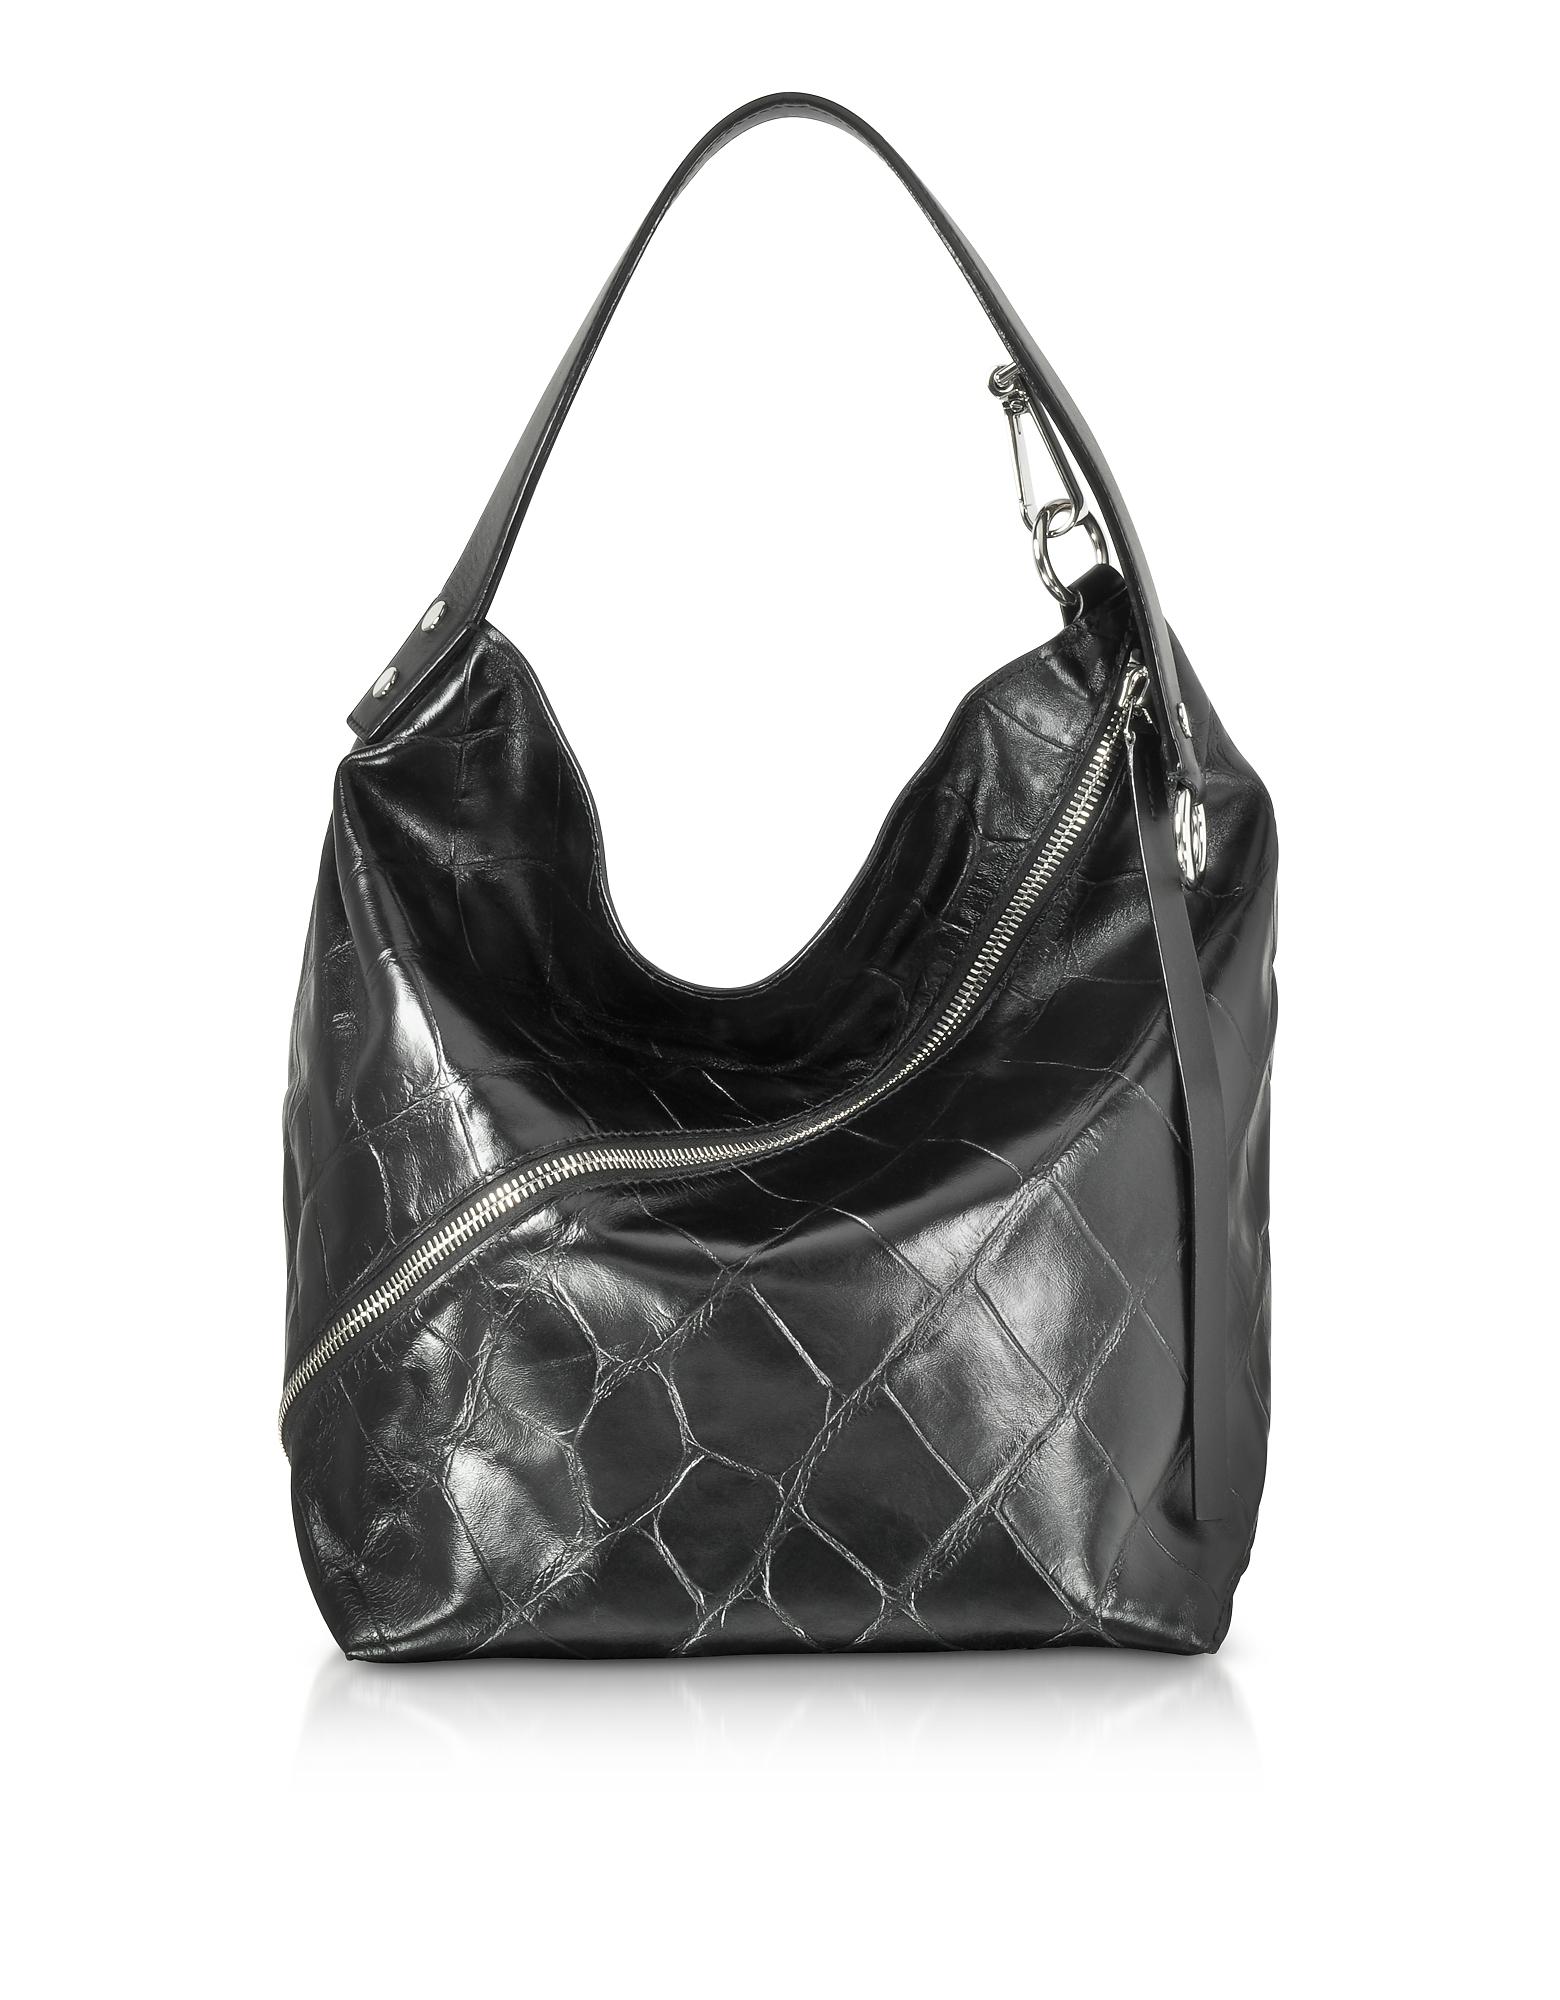 Medium Hobo Bag in Pelle nera Stampa Cocco